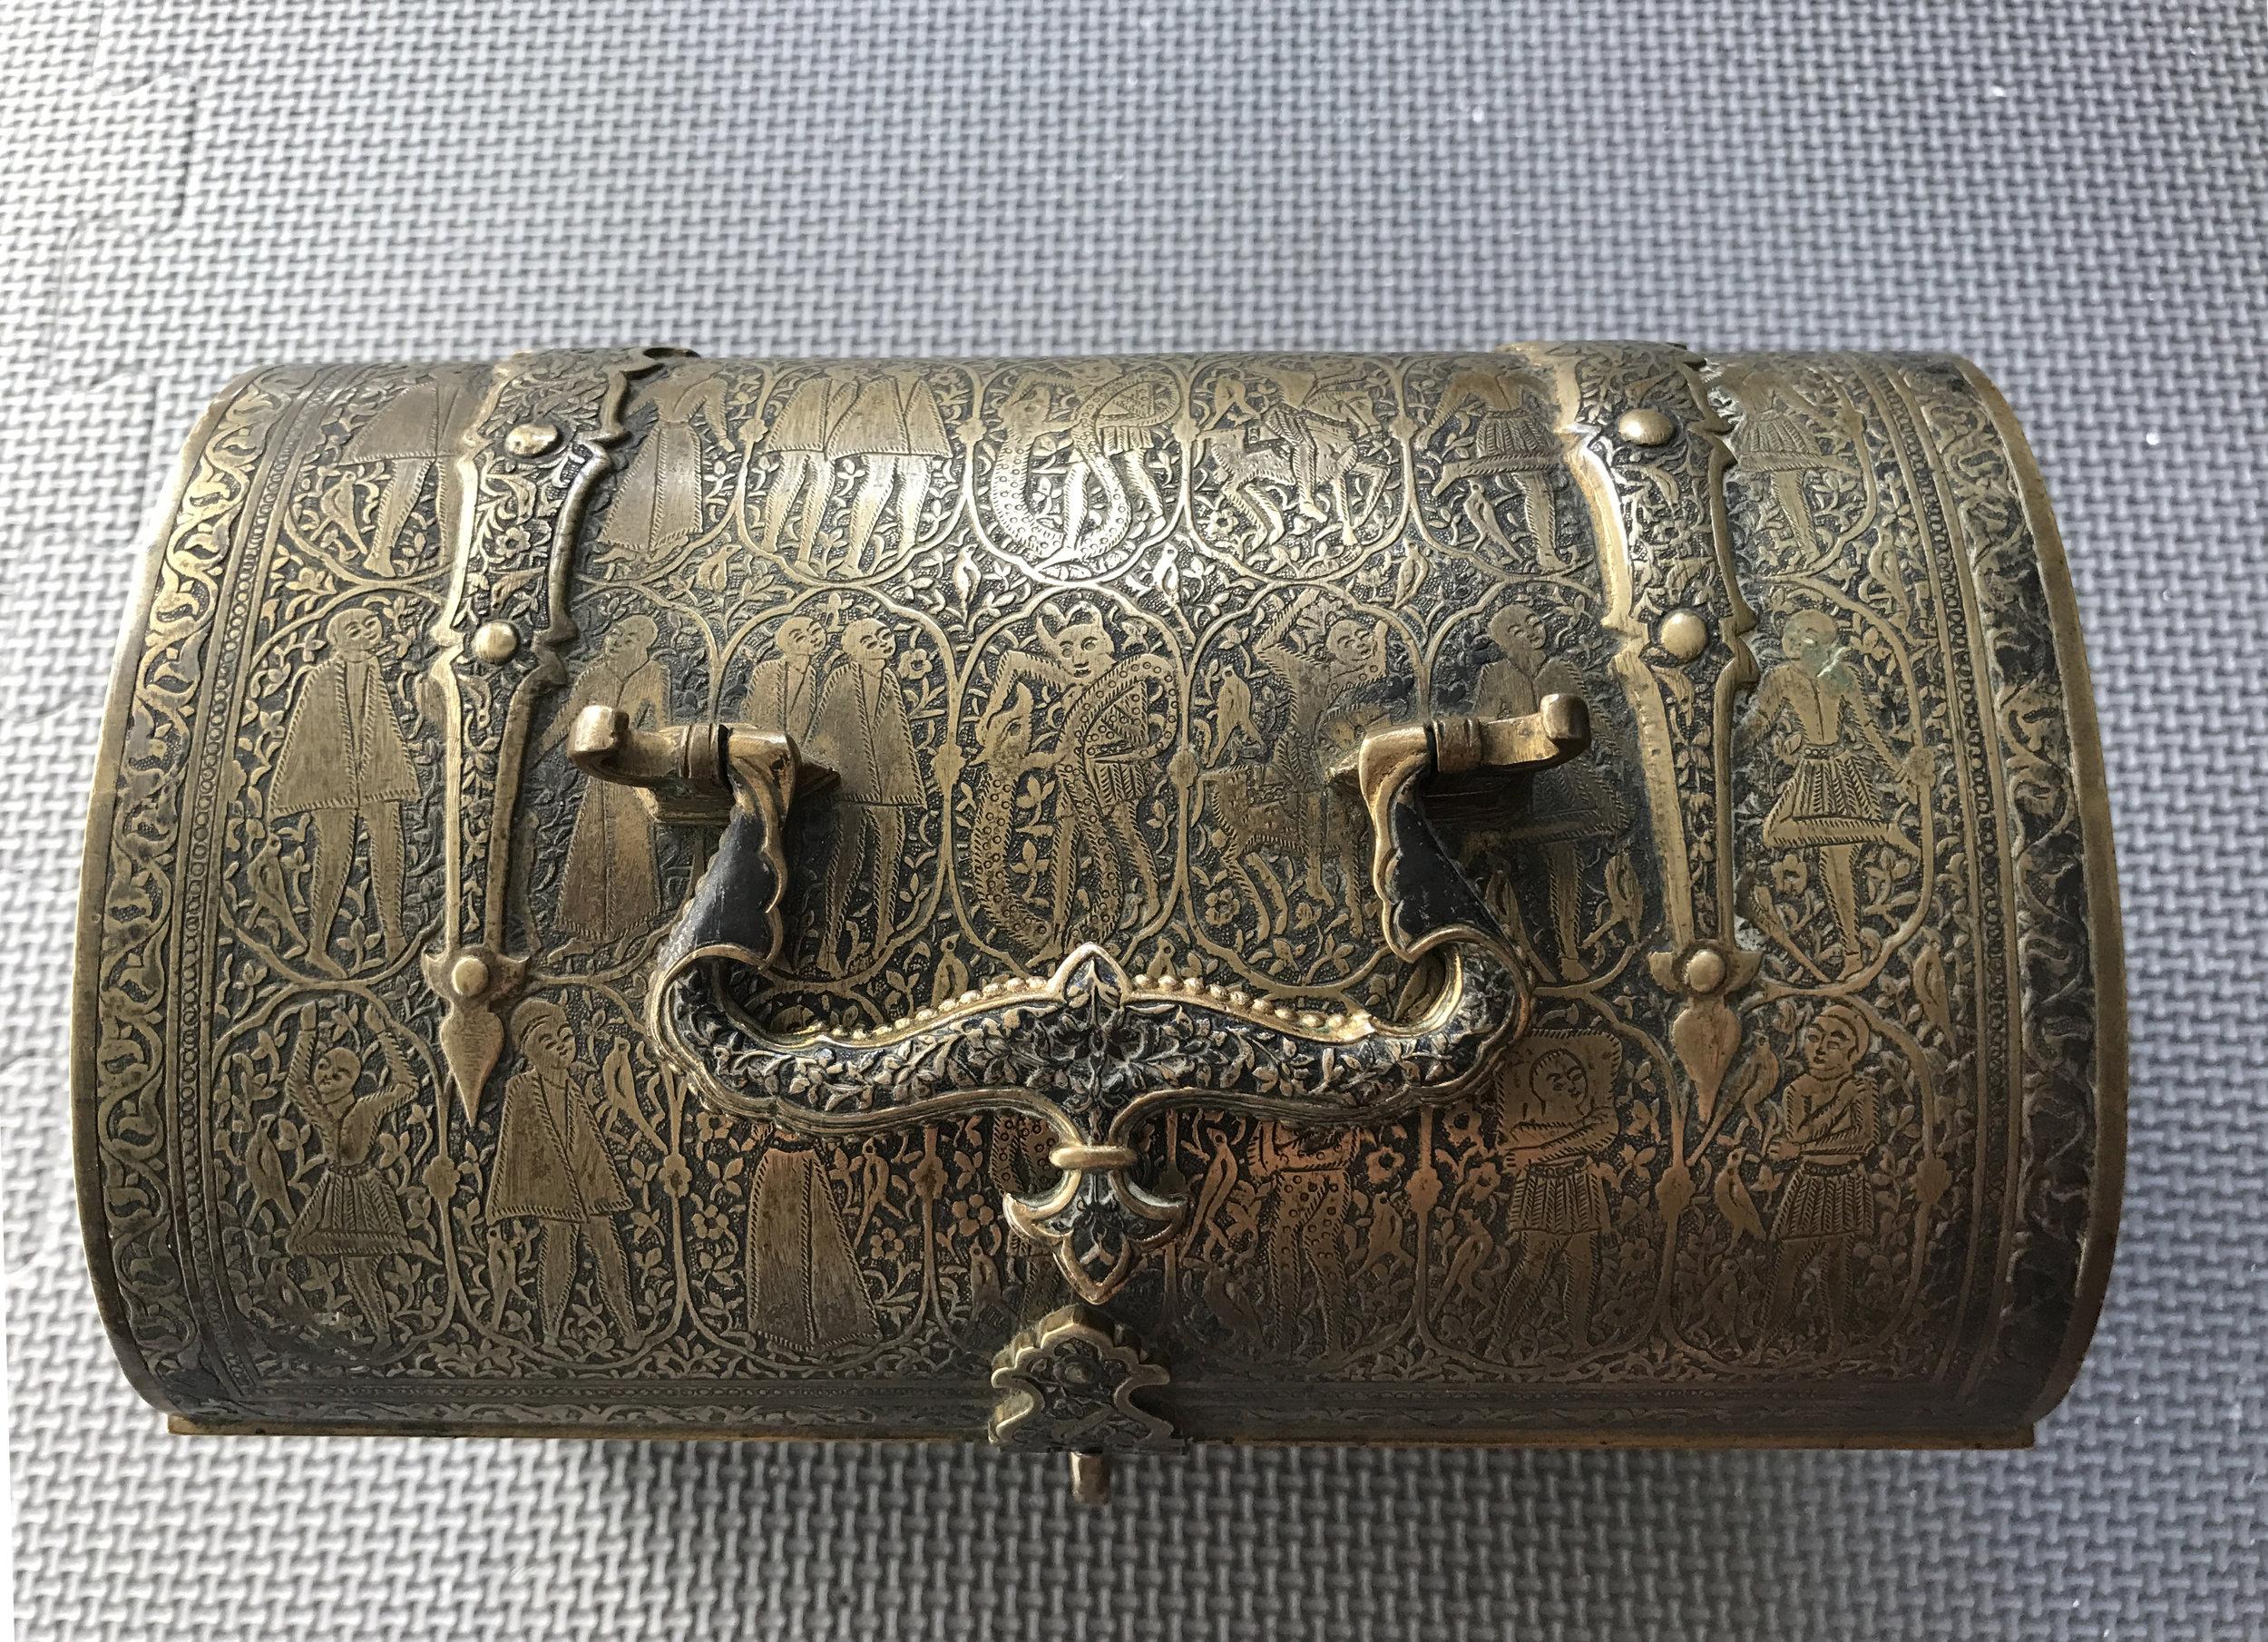 teremok_antiques_qajar_casket_4.JPG